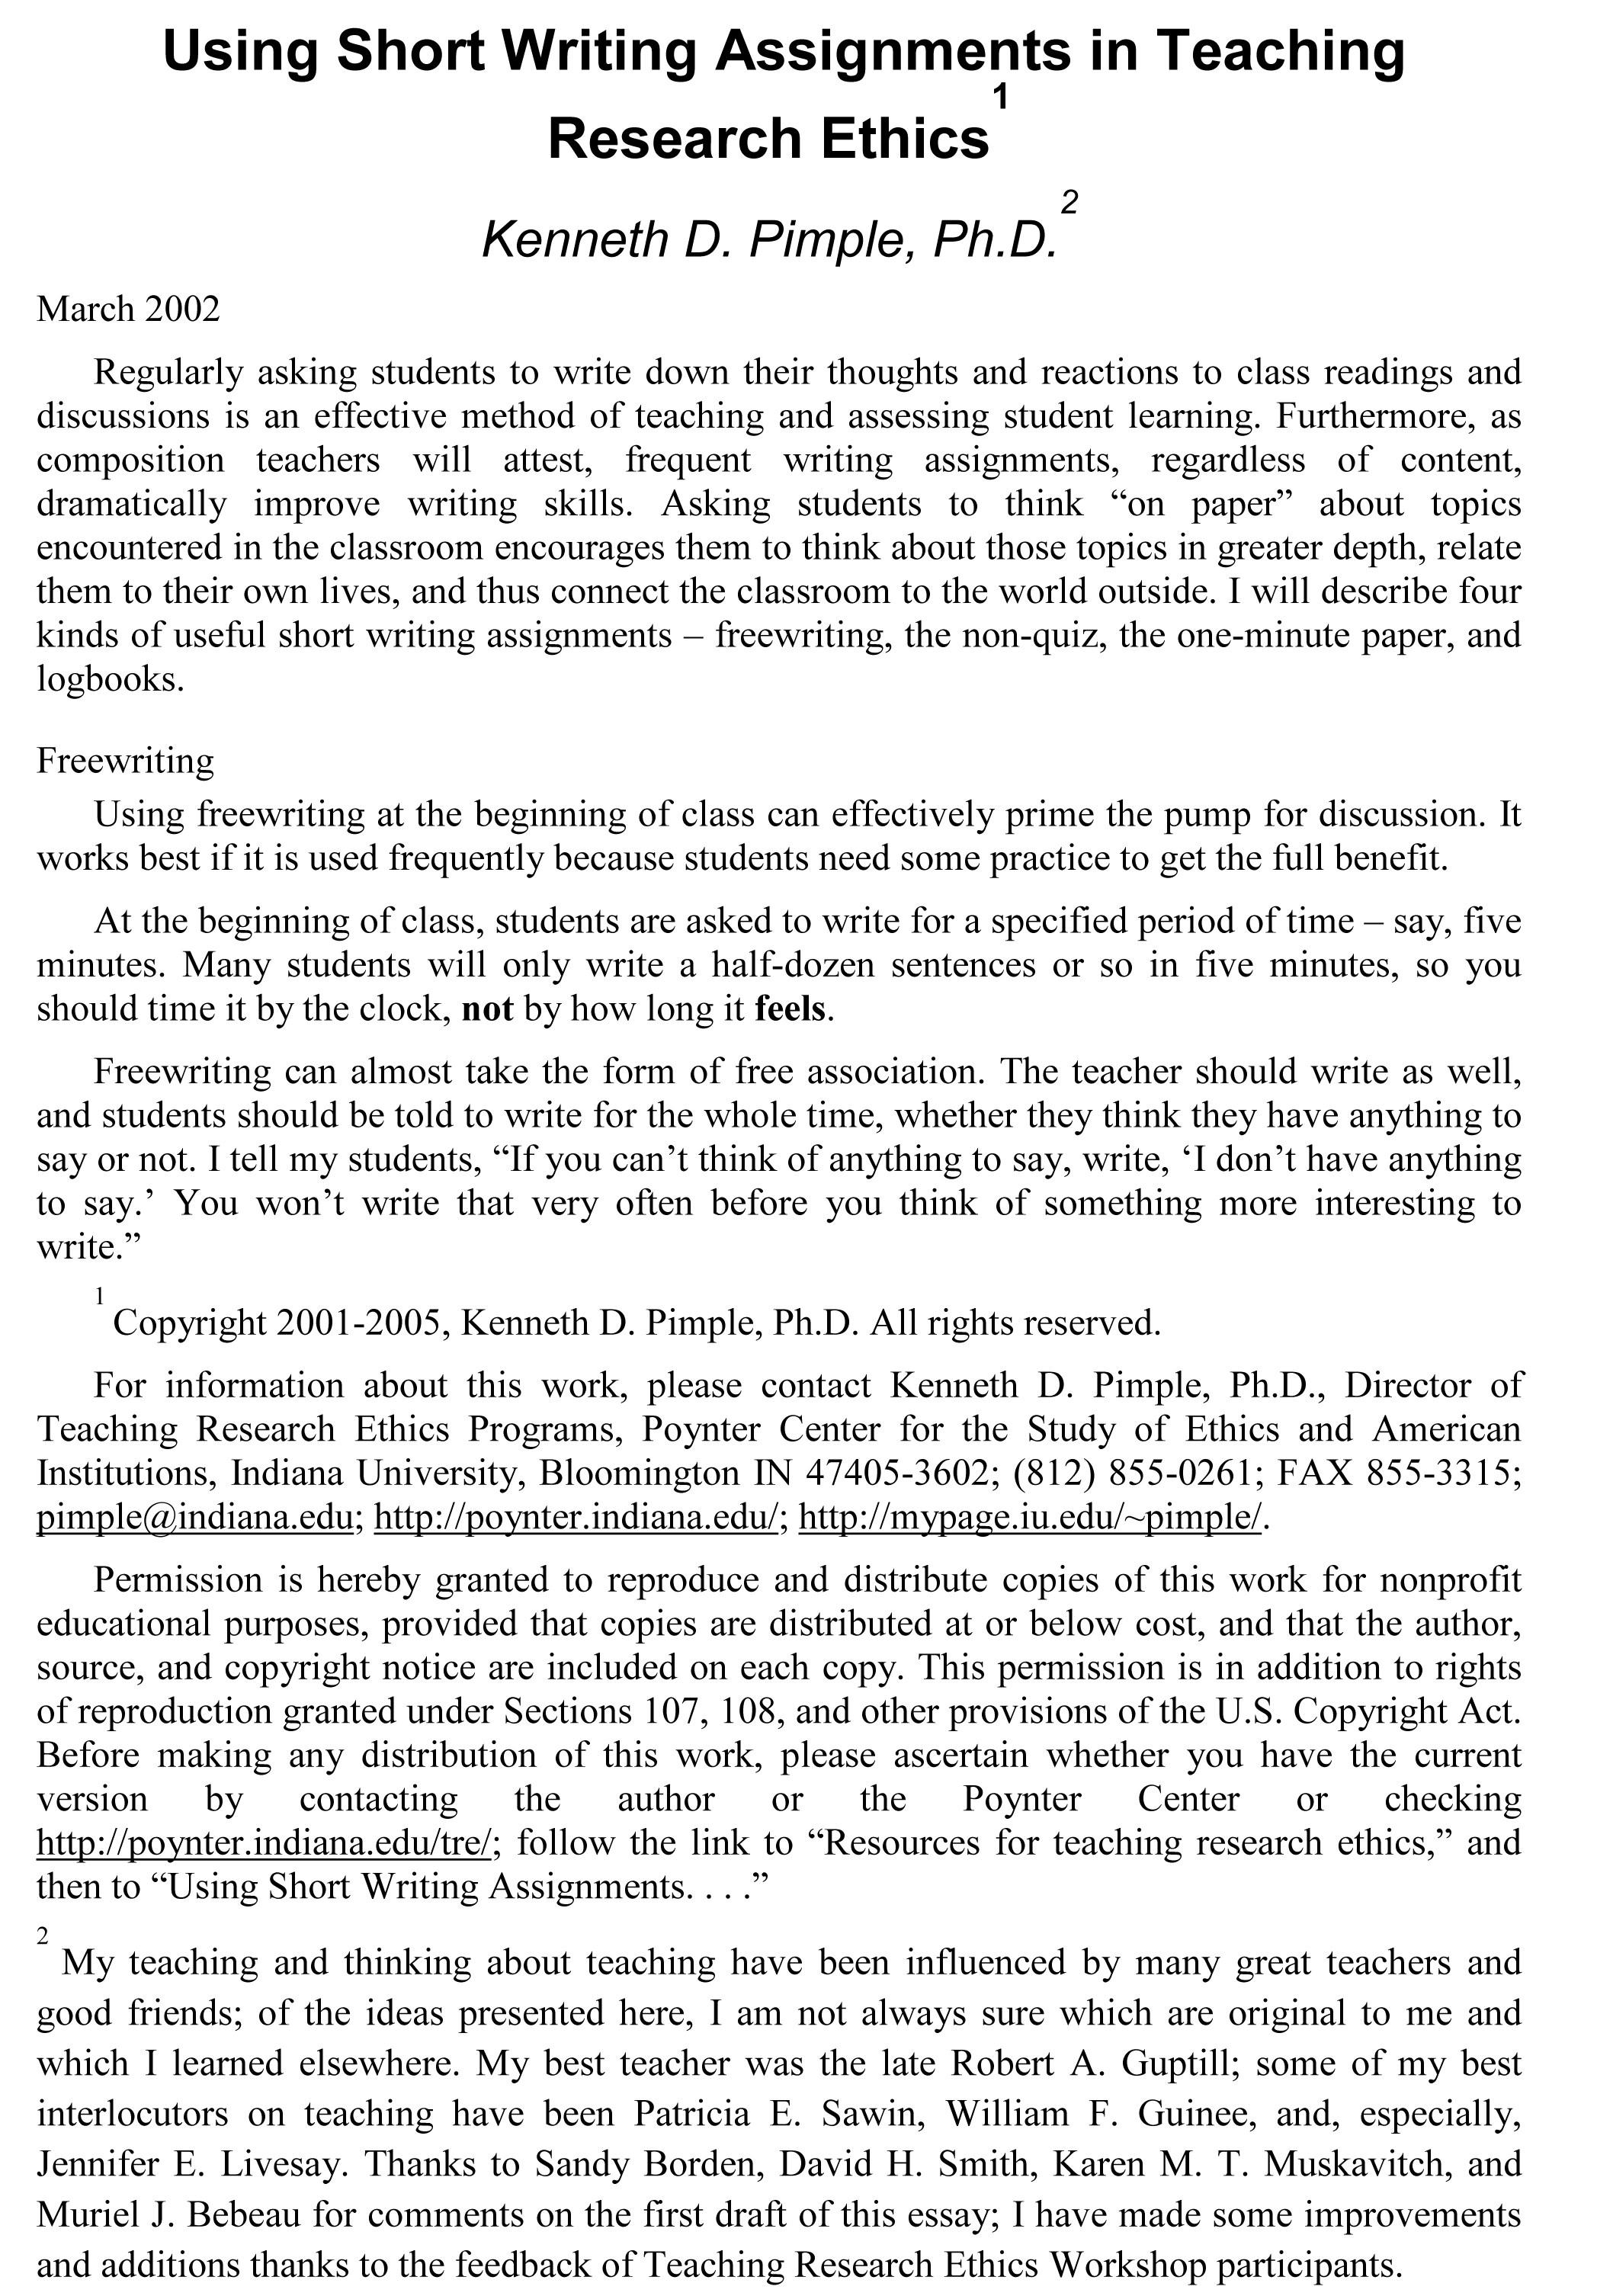 012 Essay Example Diversity Sample Fascinating Law School Full